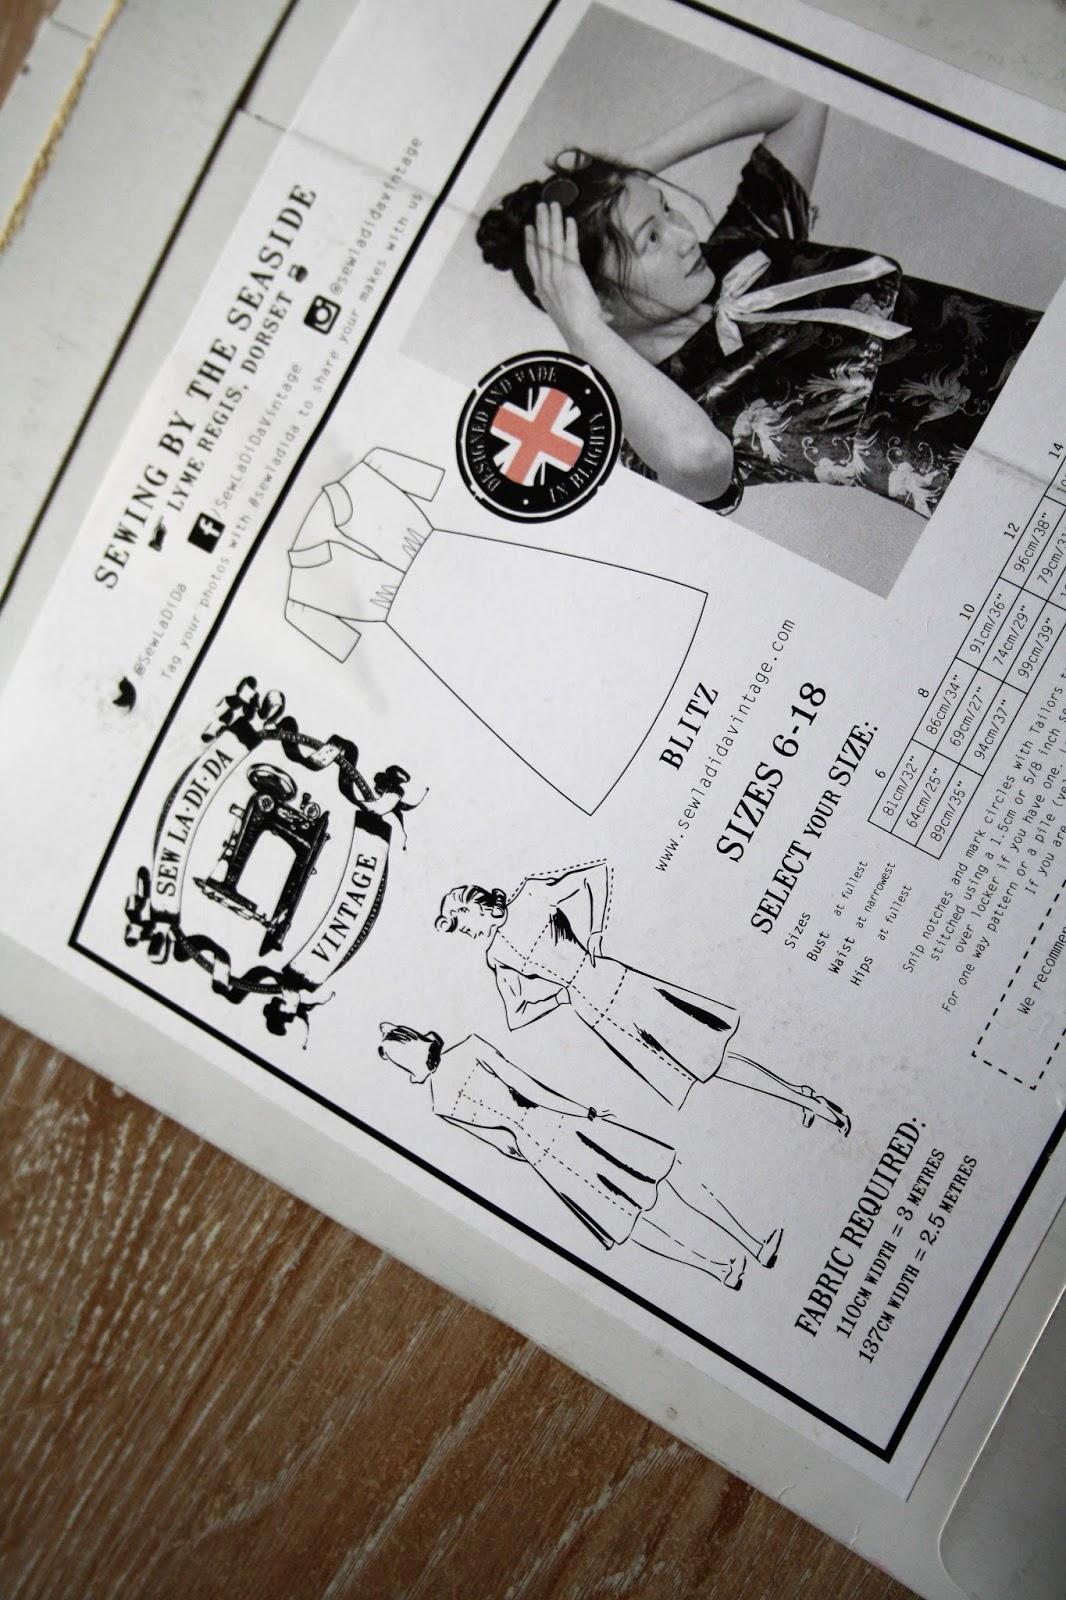 KnitWitsOwls: The Blitz Dress - Sew La Di Da Vintage - Review